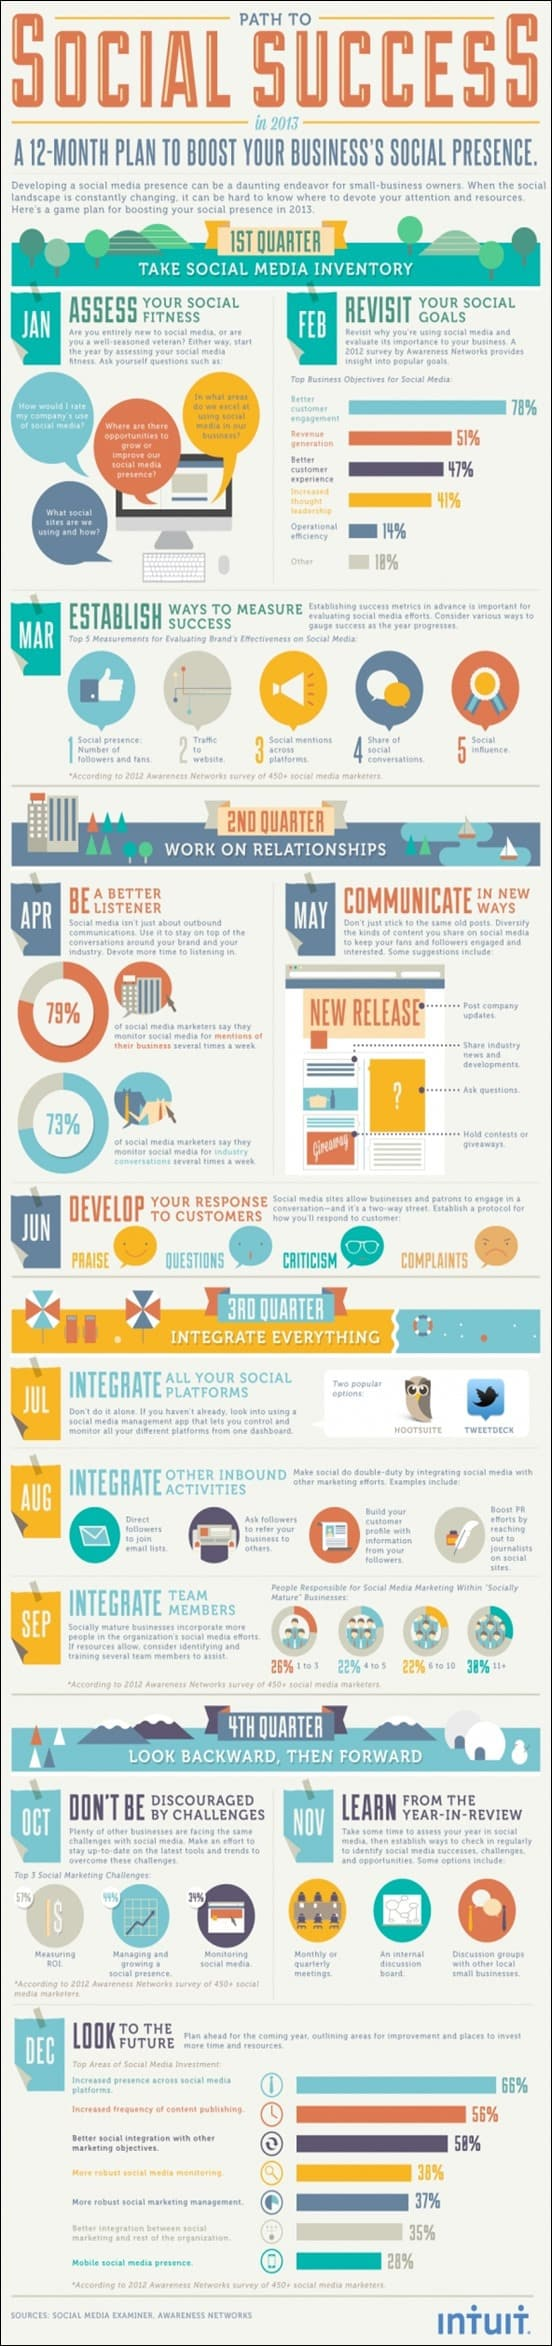 manage-social-media-the-easy-way